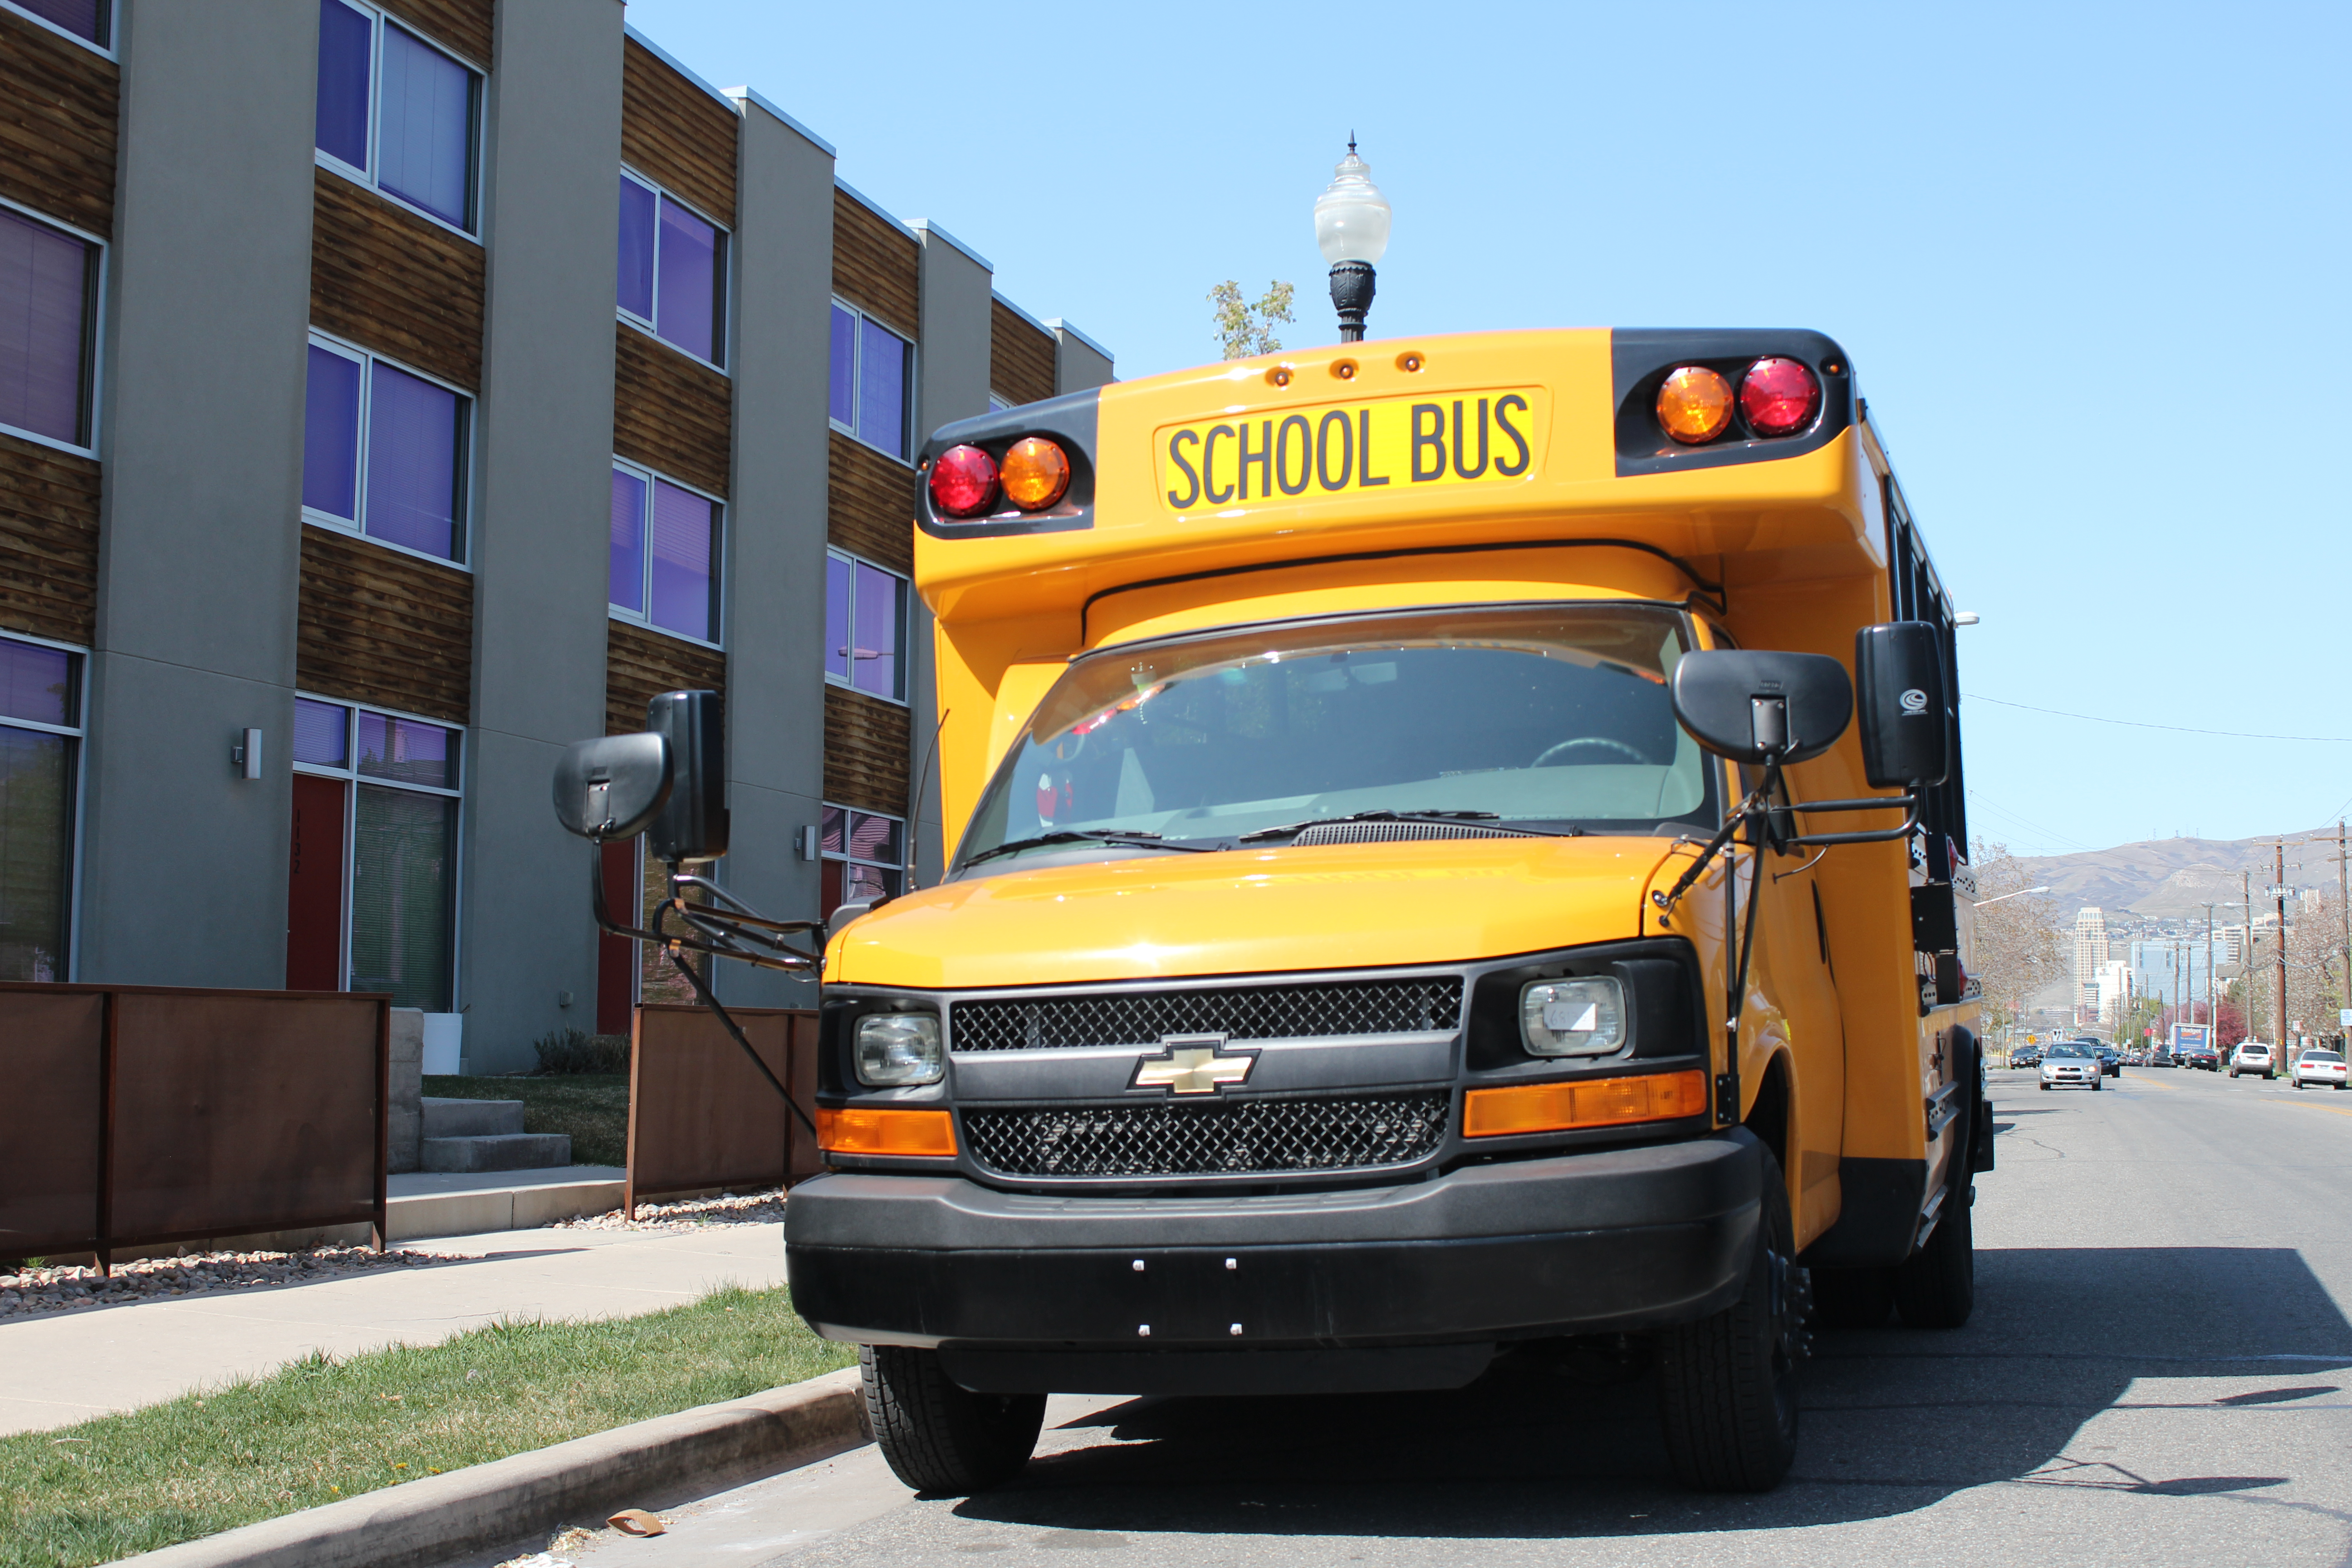 4x4 School Bus